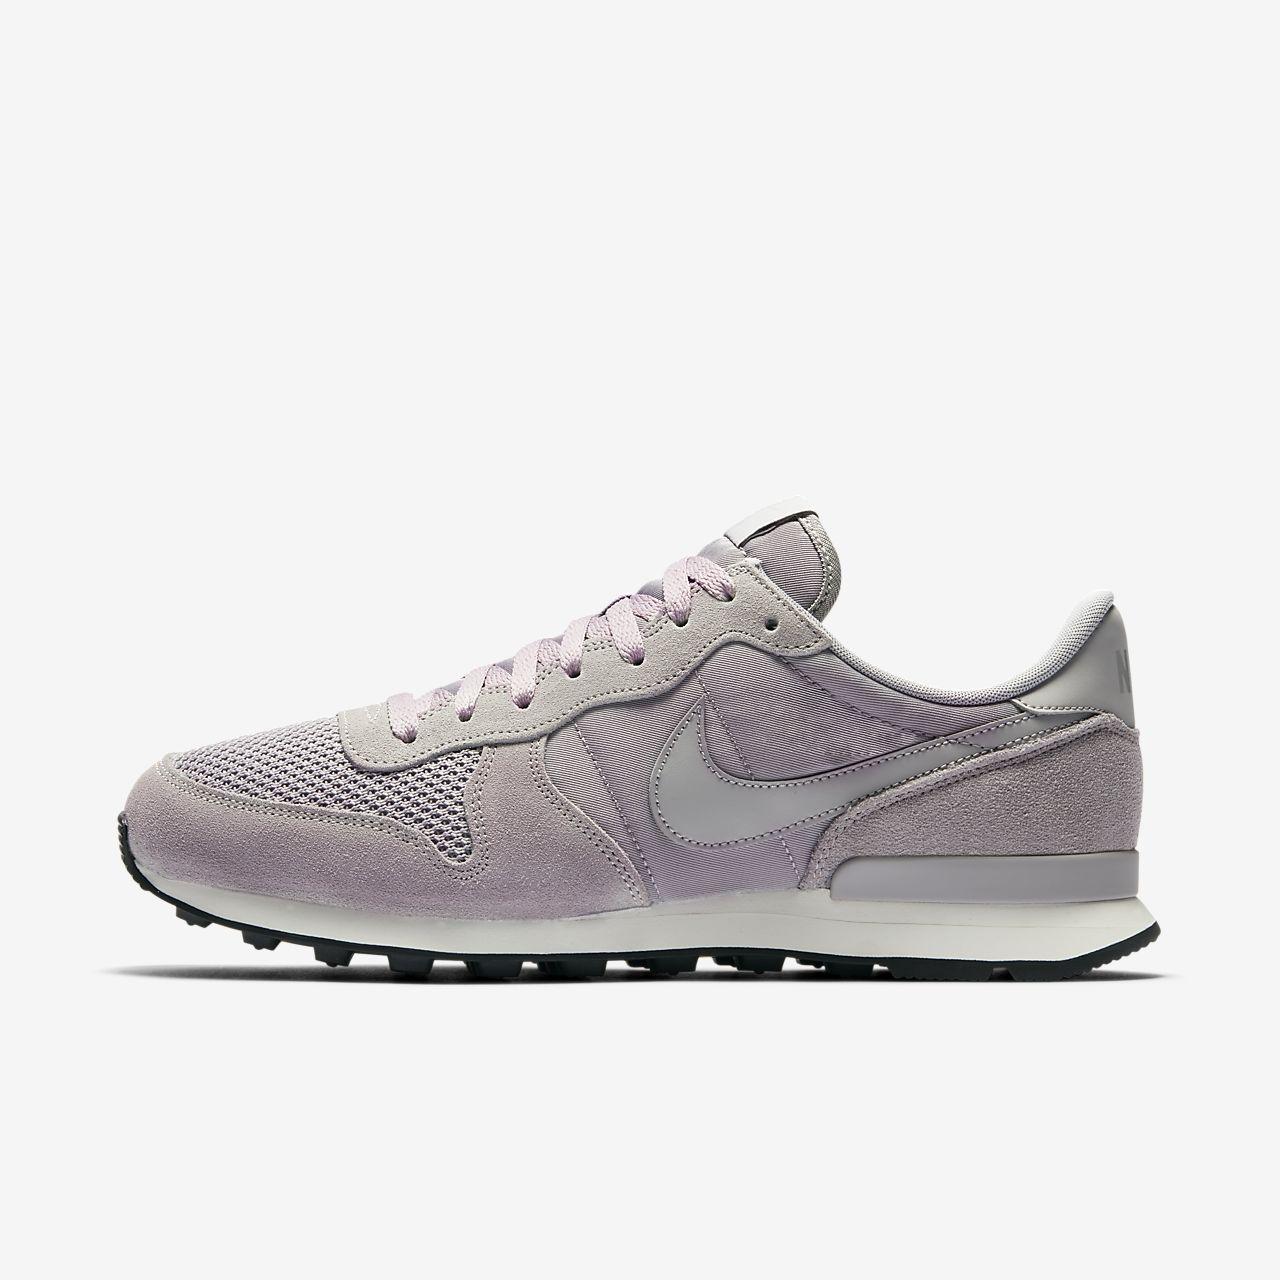 Nike Internationalist Men's Shoe Gold GA1427890